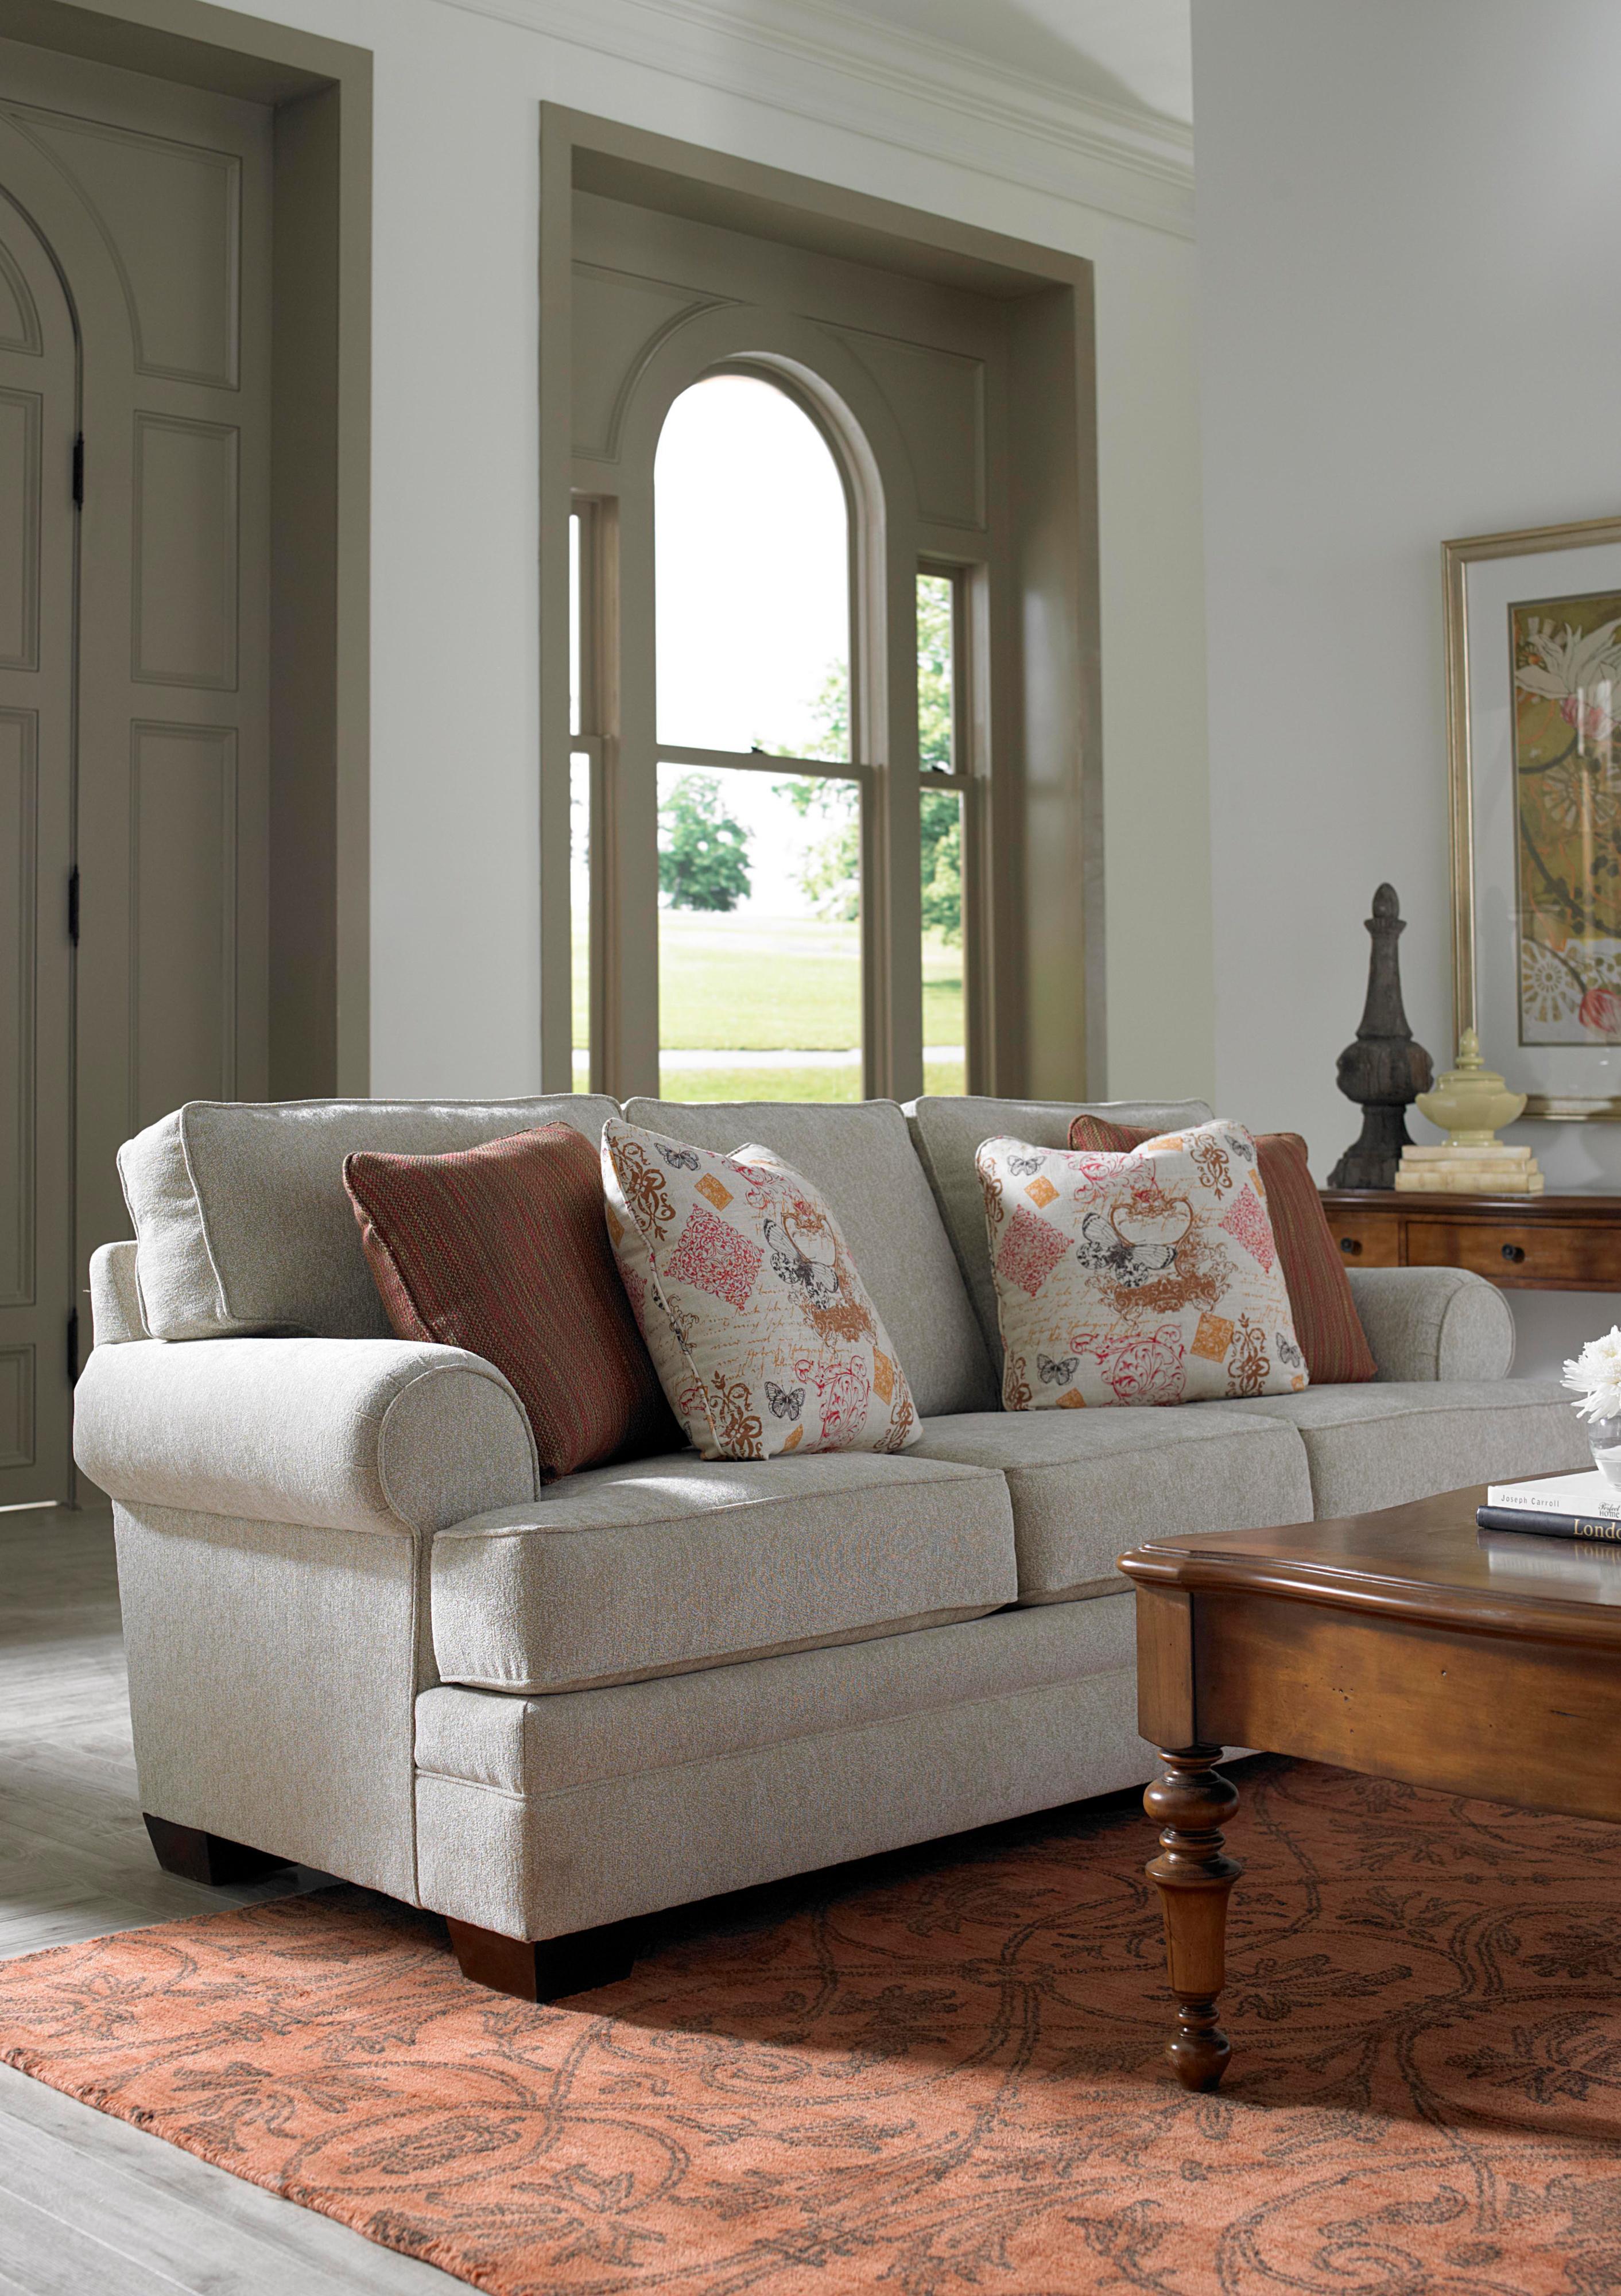 Broyhill Furniture Landon Transitional Chair and Ottoman Set